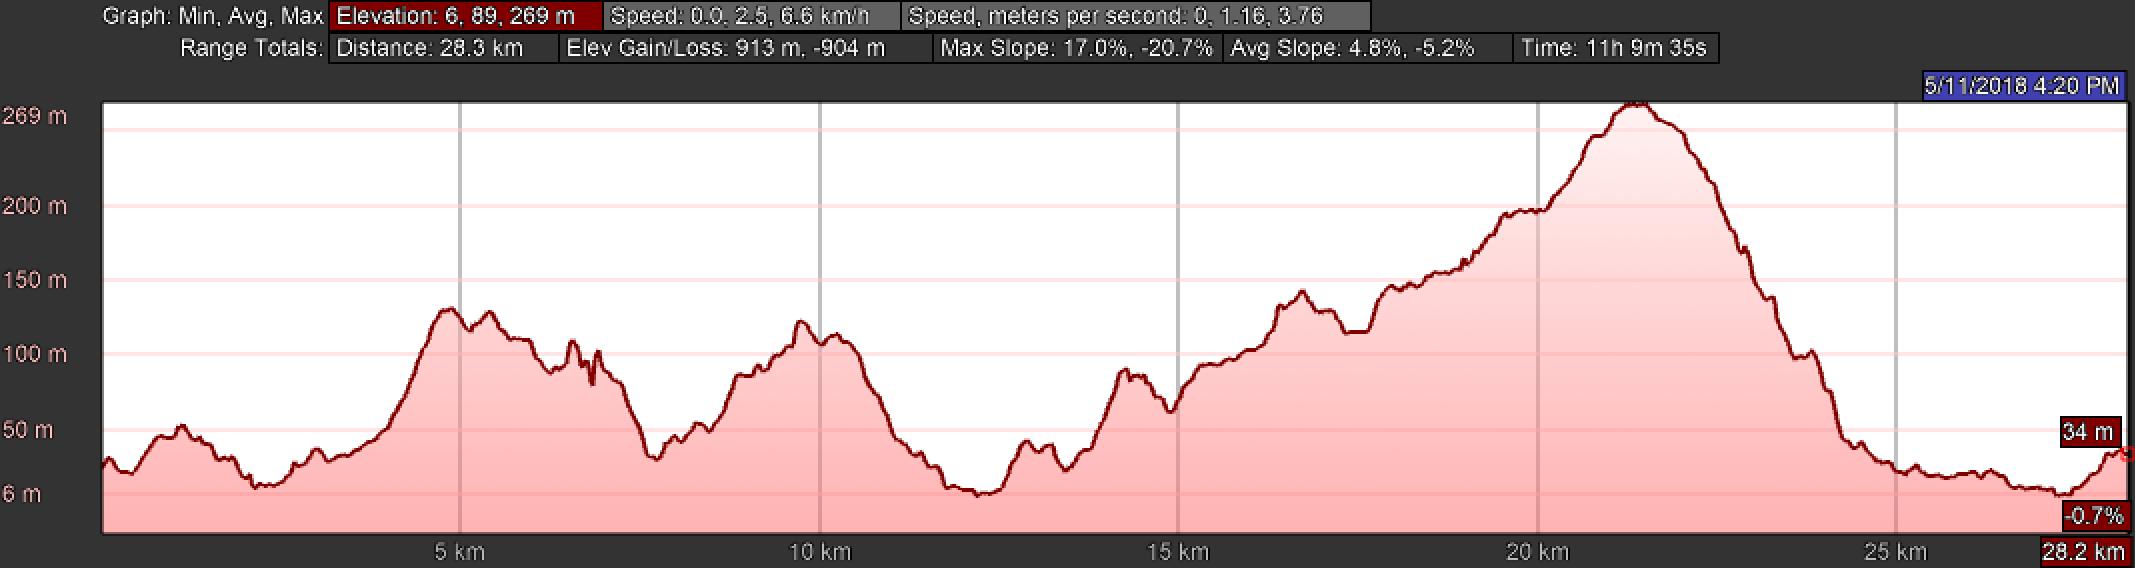 Elevation Profile Camino Finisterre to Muxía